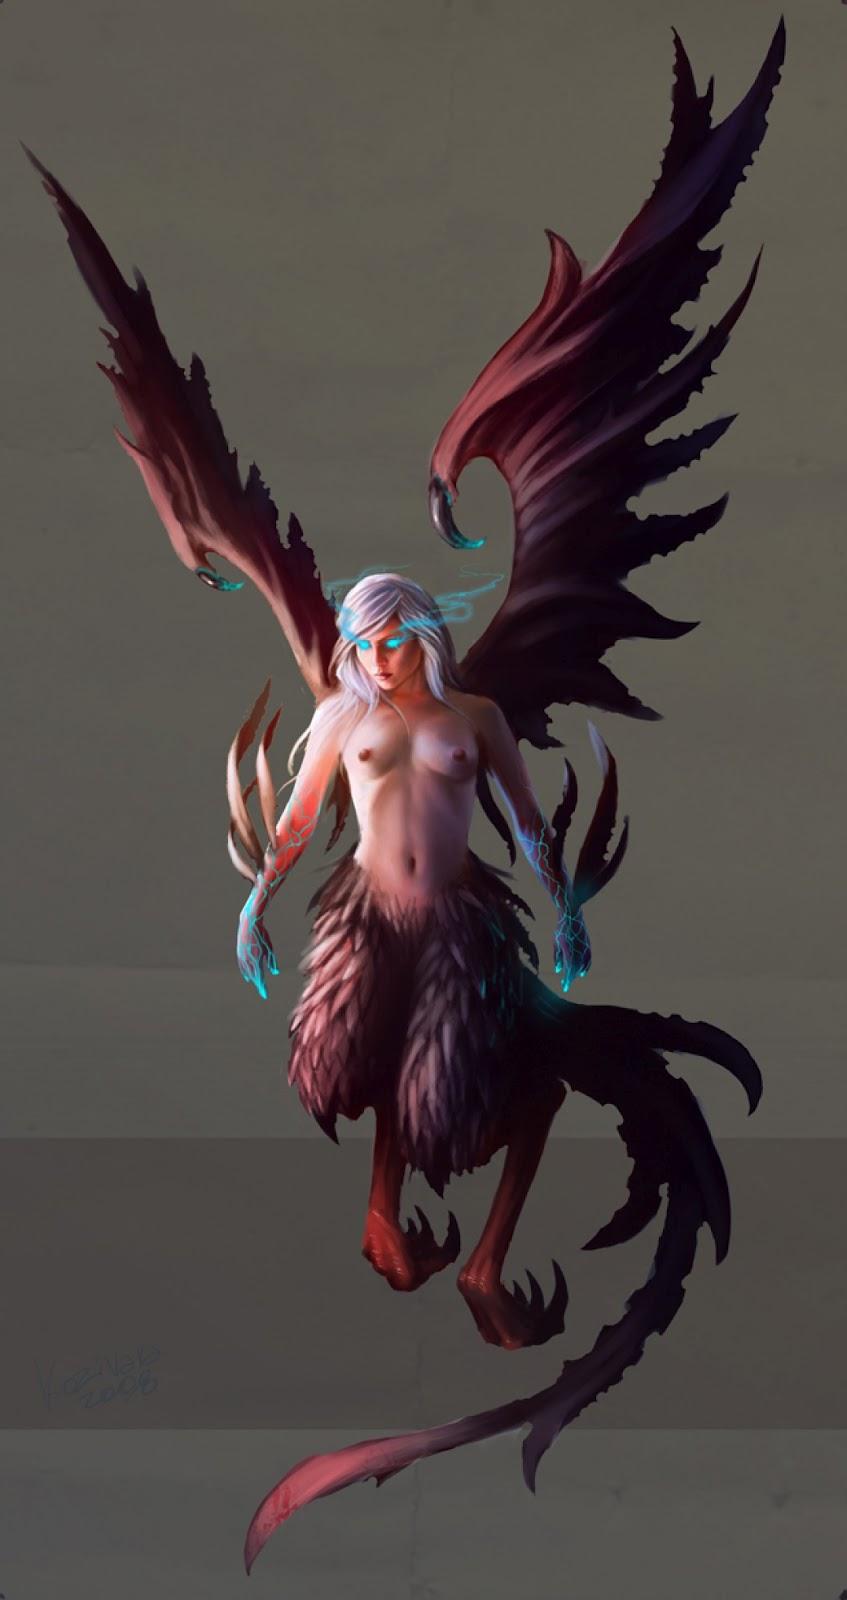 Harpy concept por Kozivara